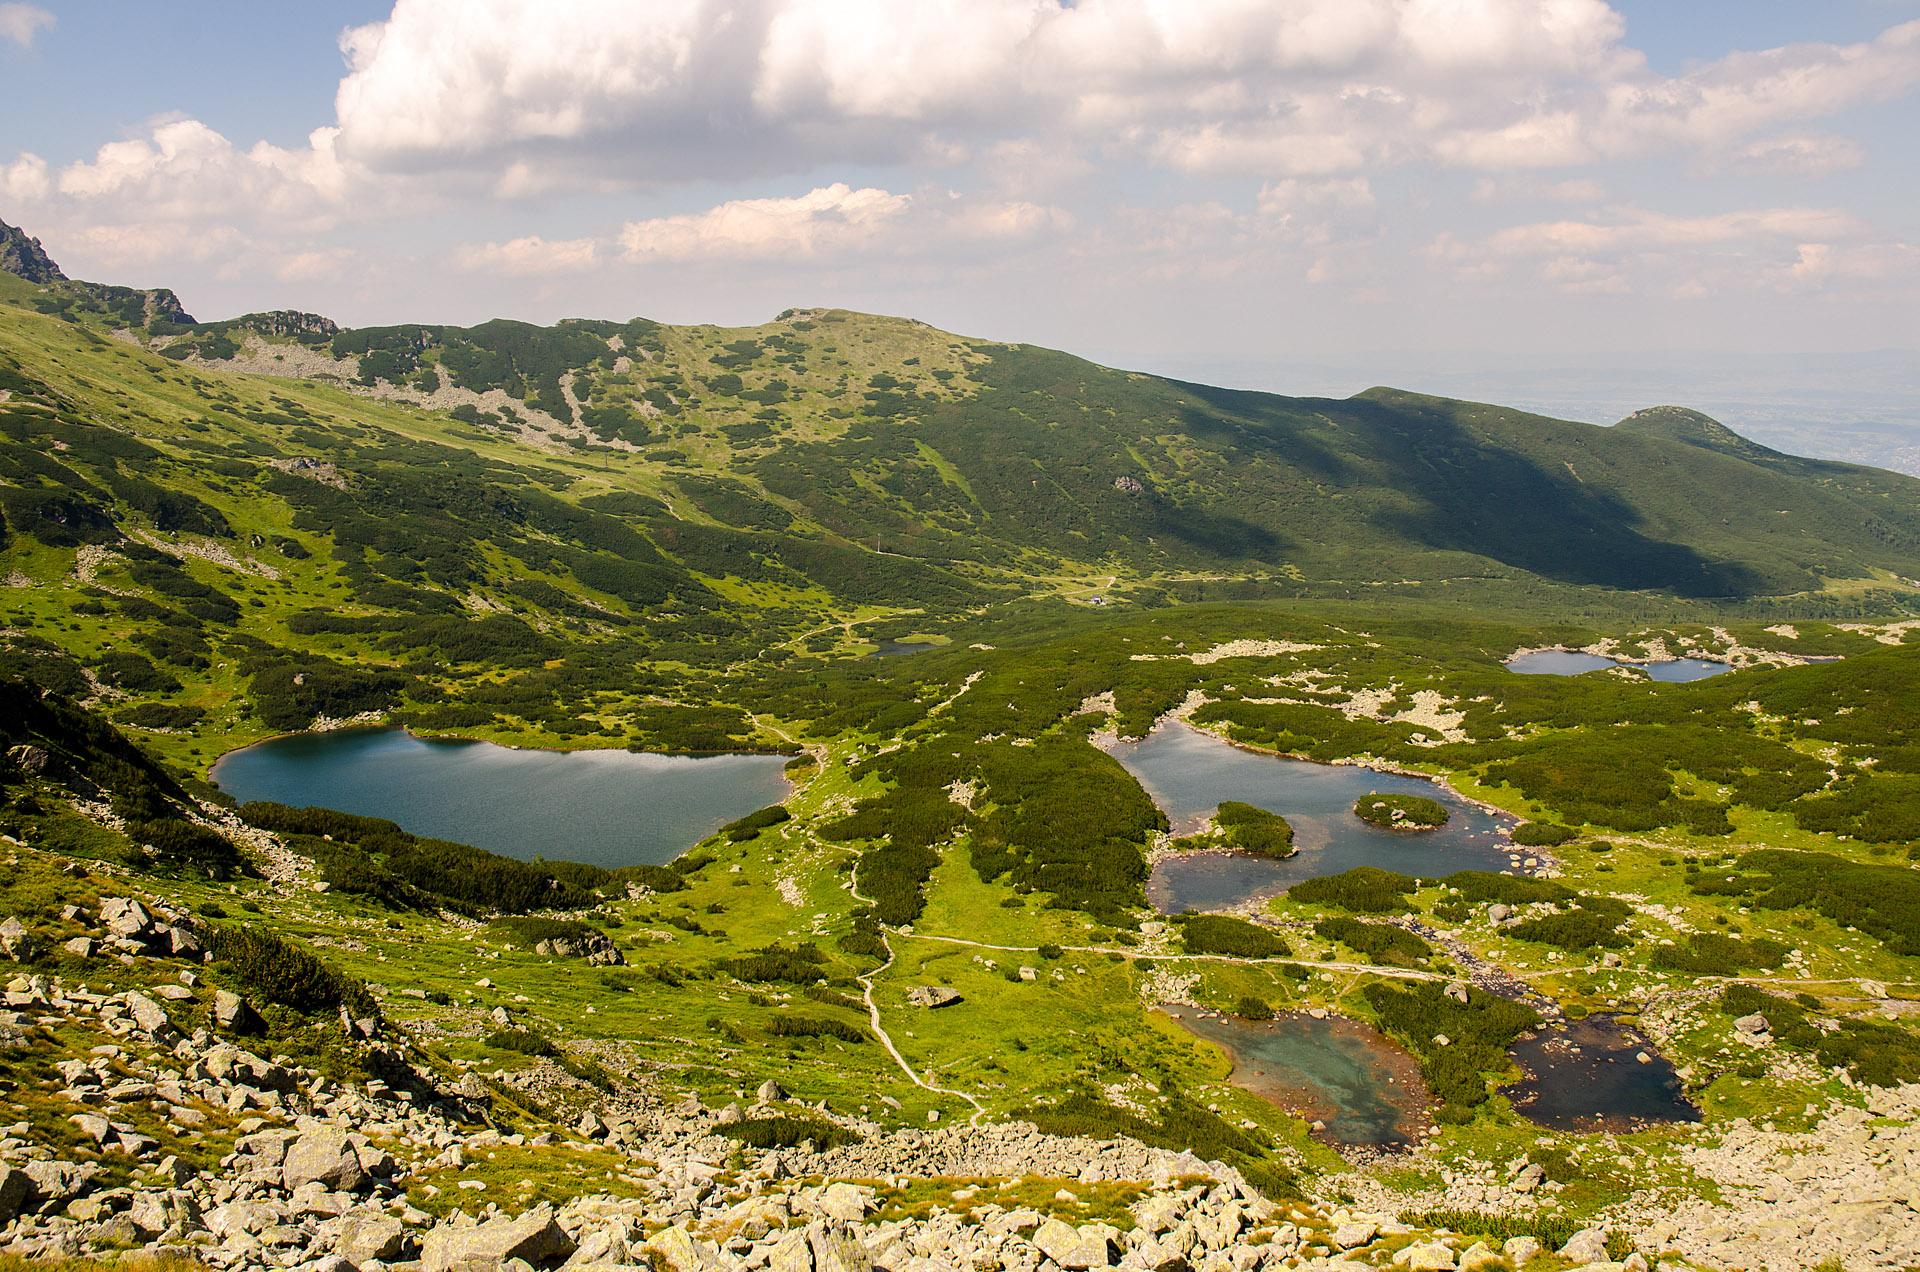 Dolina Gasienicowa ('Valley Track')